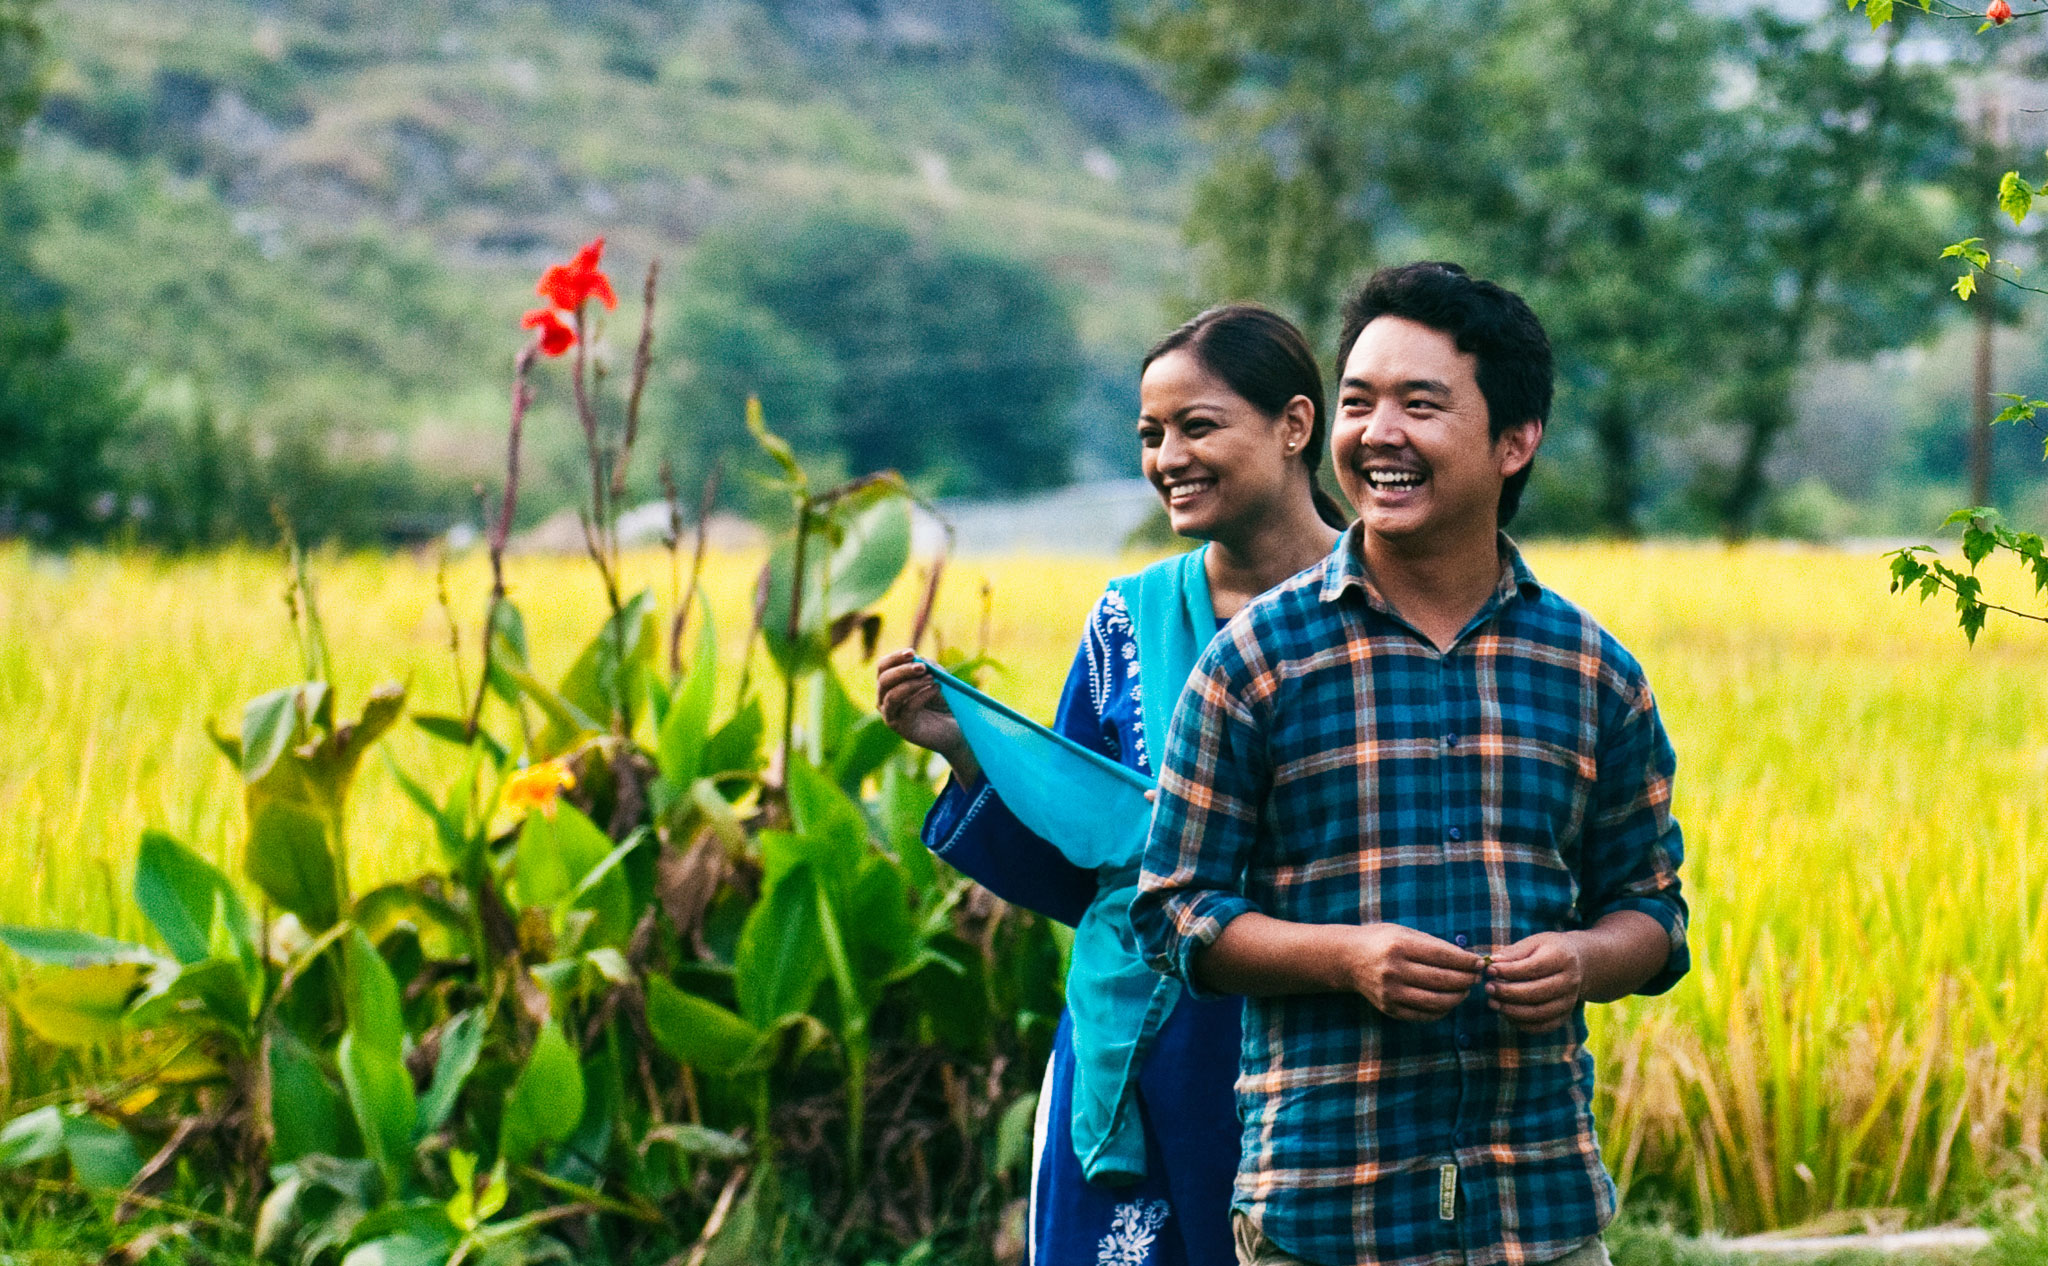 Nepali actress Reecha Sharma and Nepali stage actor Tika Bhakta Jirel enjoying a laugh during a break from filming of 'Nine Million Stars'. | Image courtesy of Jan Kath.